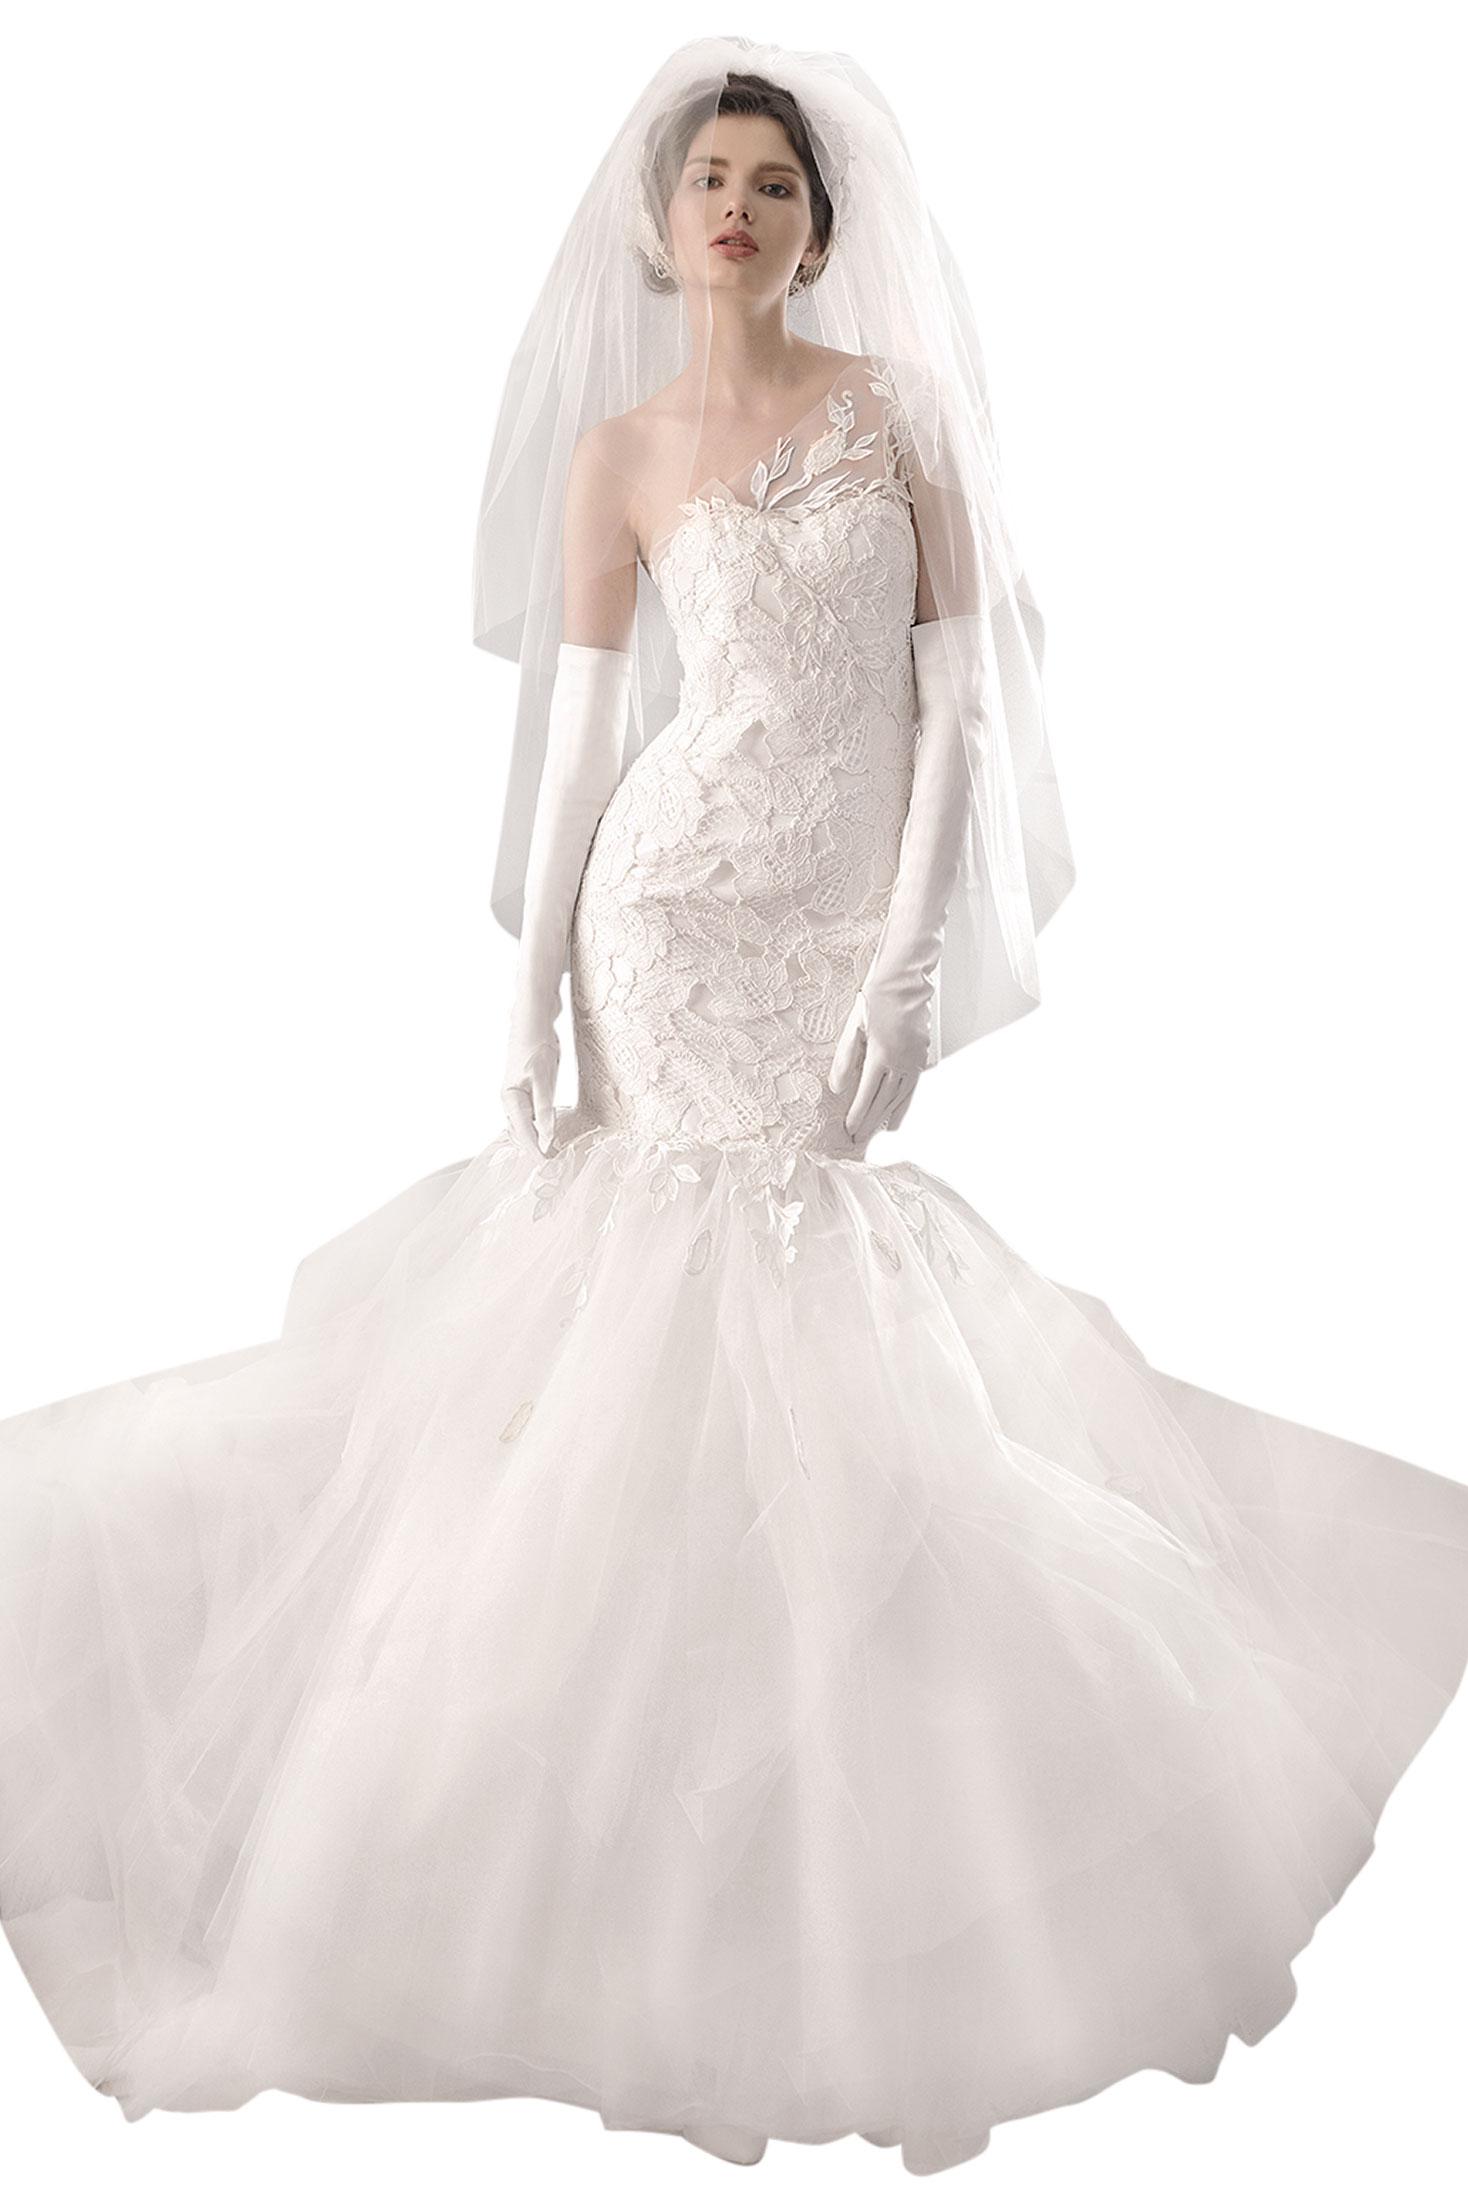 best websites to buy wedding dresses photo - 1